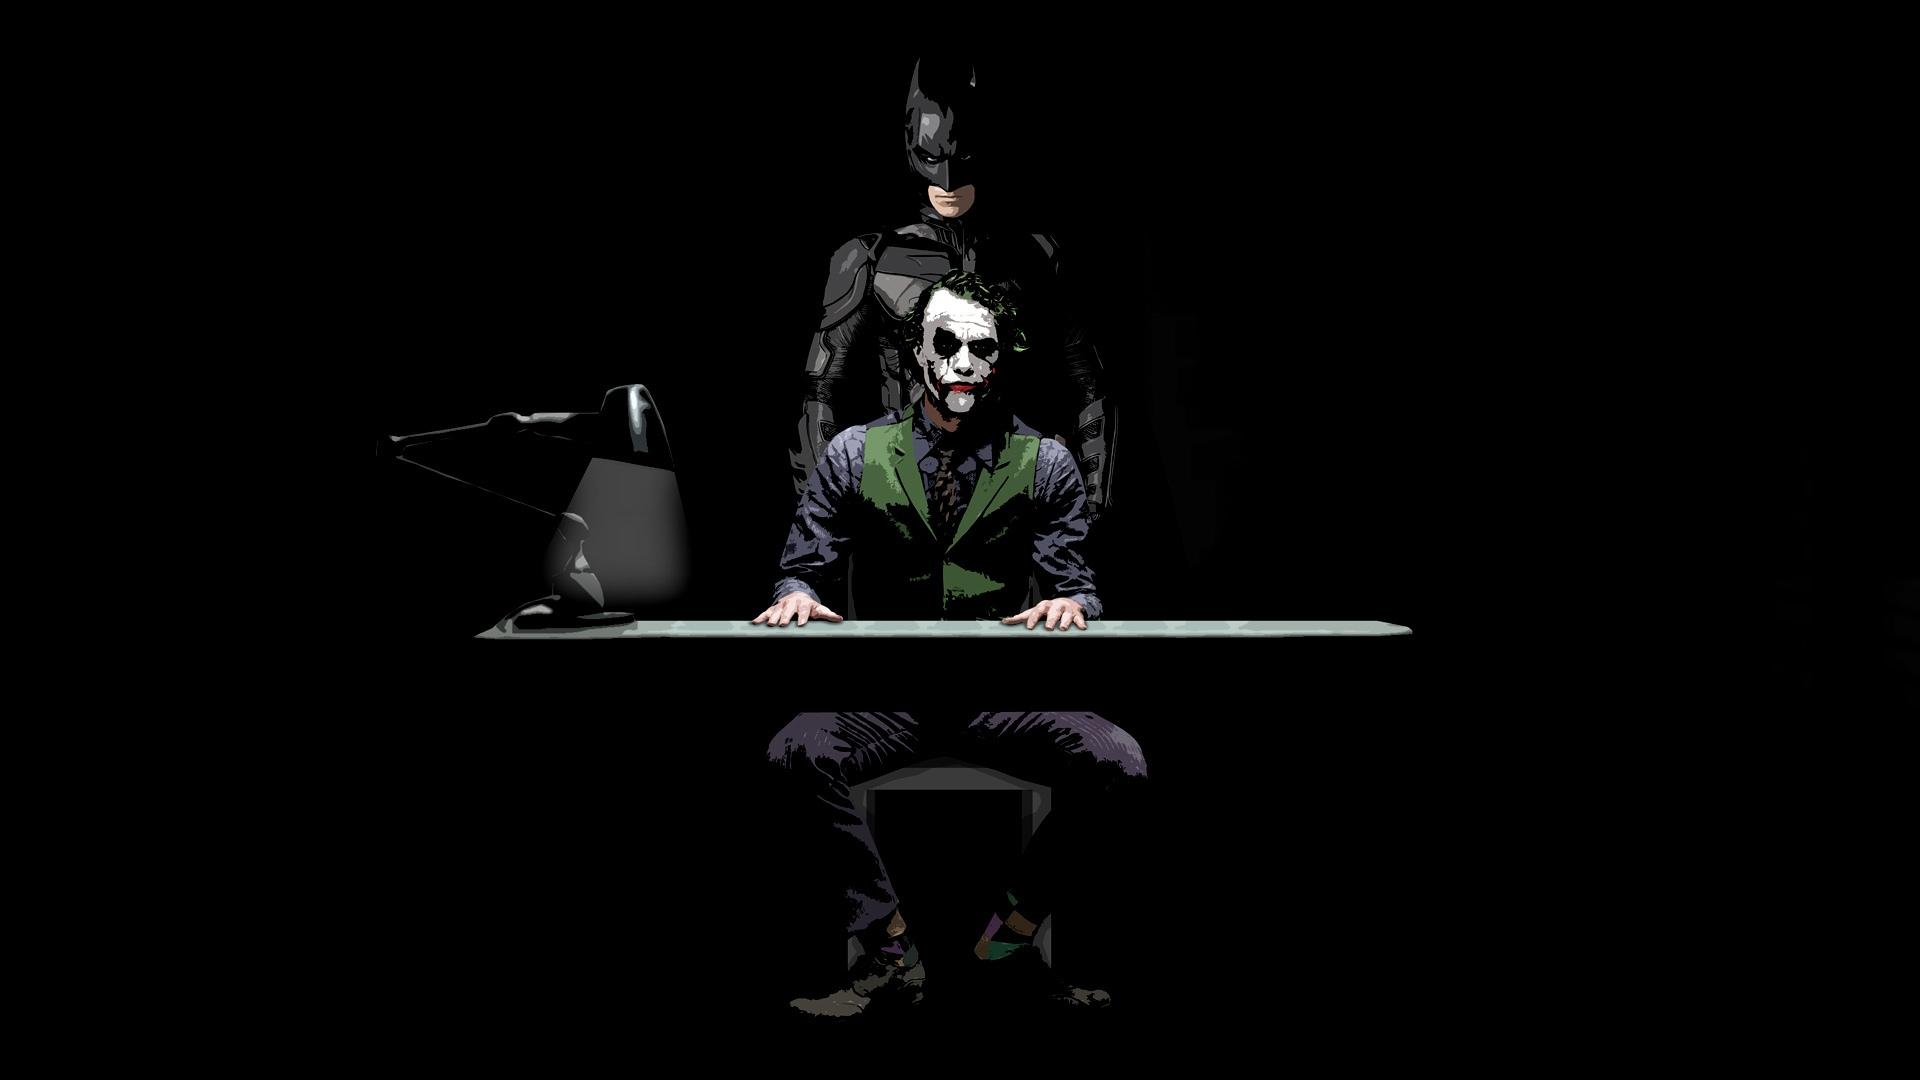 Batman and Joker Sketch 3D Wallpaper   HQ Wallpapers download 100 1920x1080